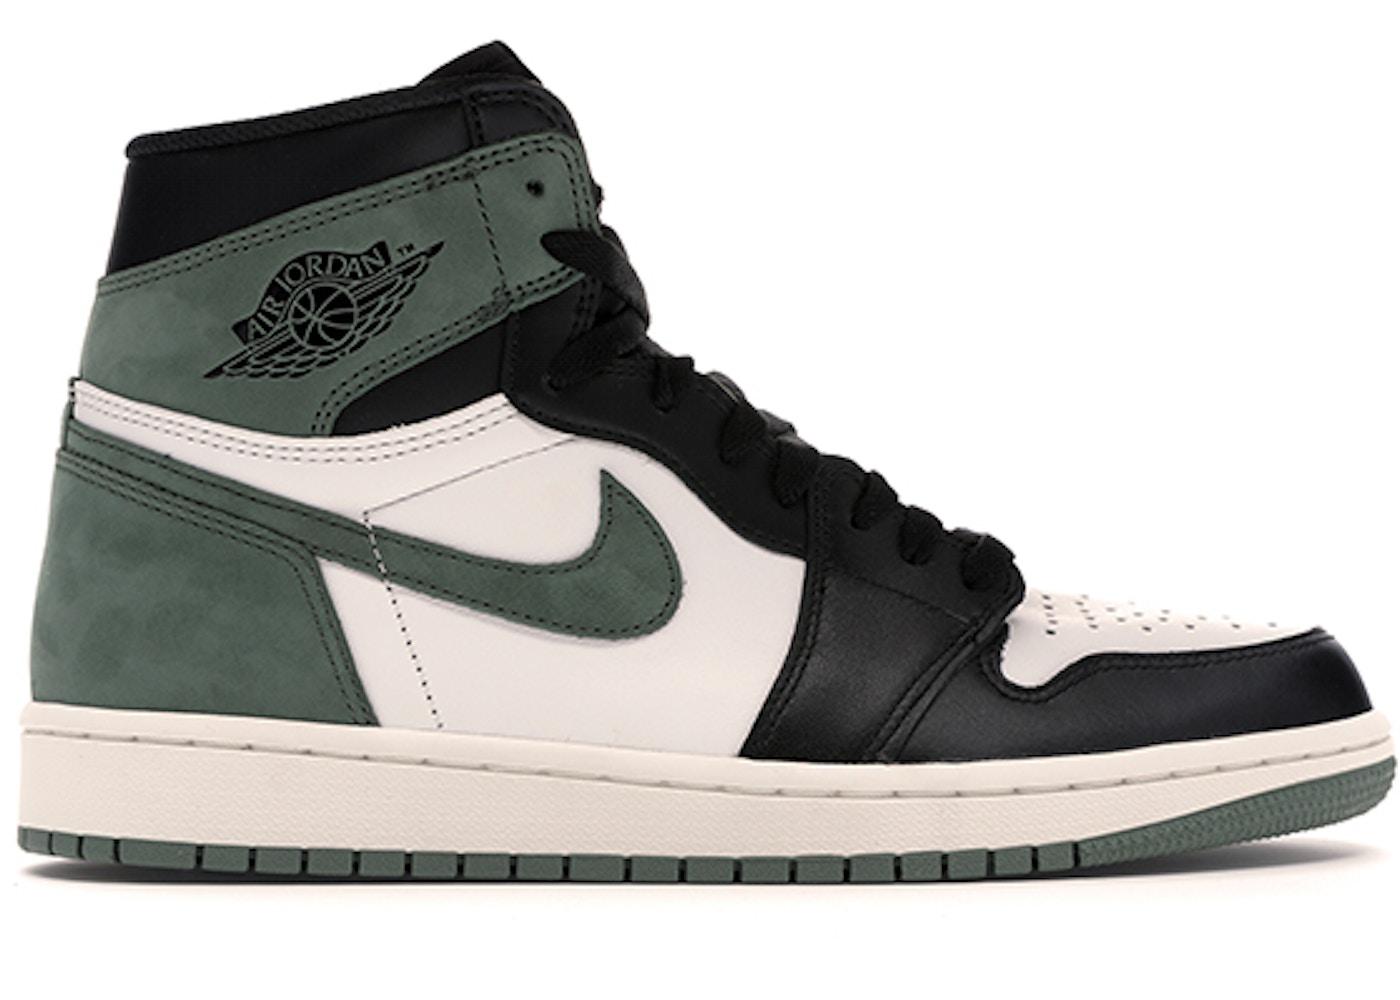 8dce85aa356b Buy Air Jordan 1 Shoes   Deadstock Sneakers